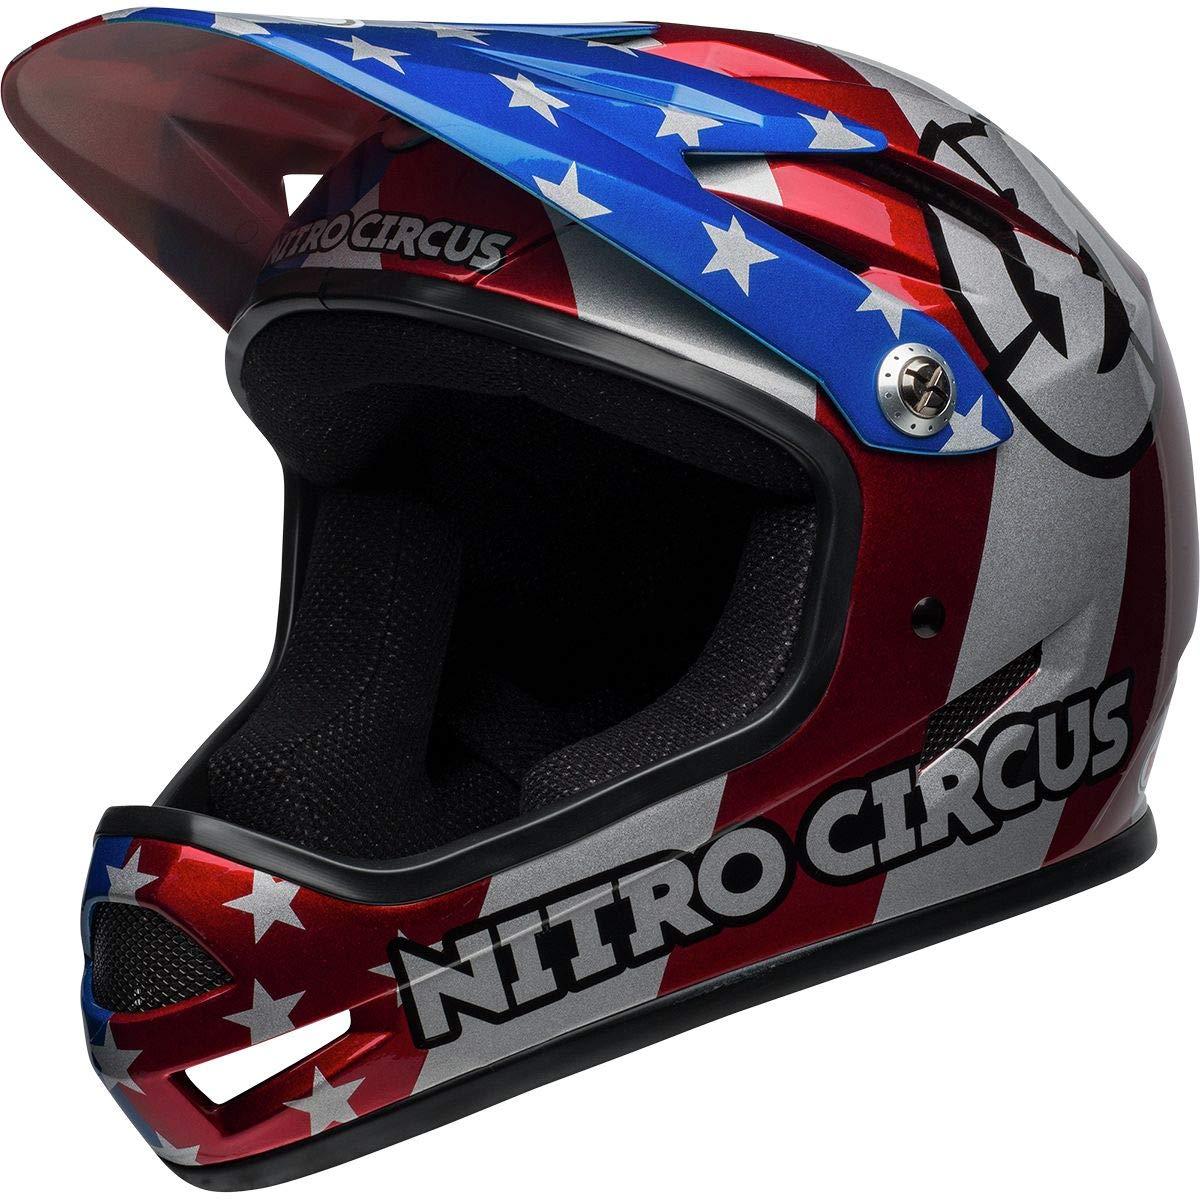 Bell Sanction Bike Helmet - Nitro Circus Gloss Silver/Blue/Red X-Small